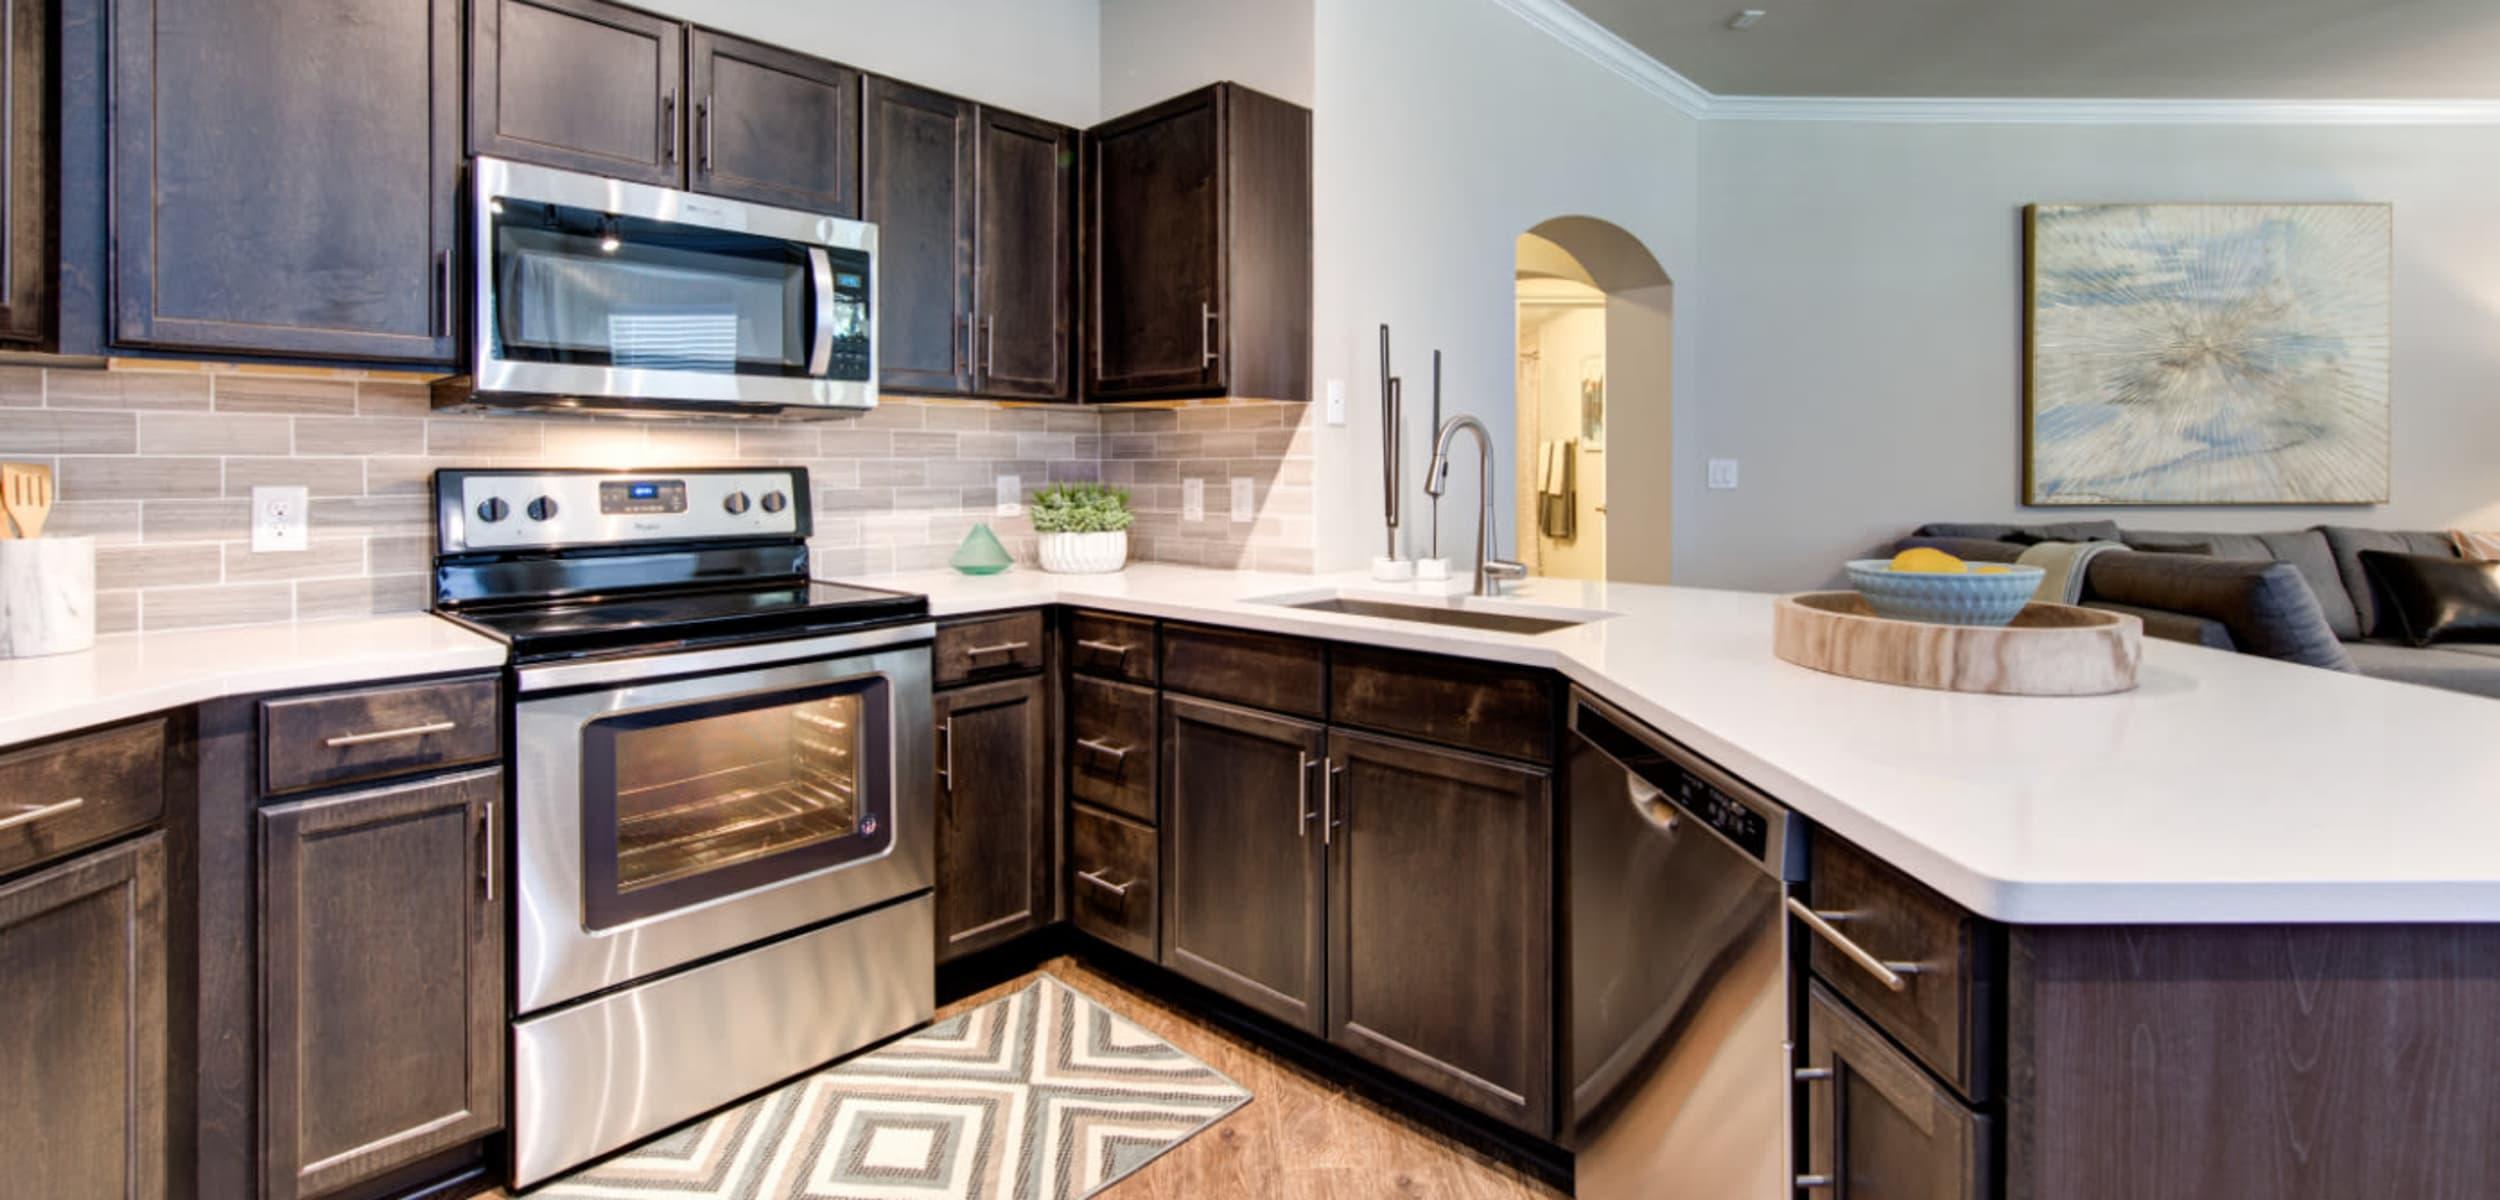 Modern, sleek kitchen at Marquis at Cinco Ranch in Katy, Texas